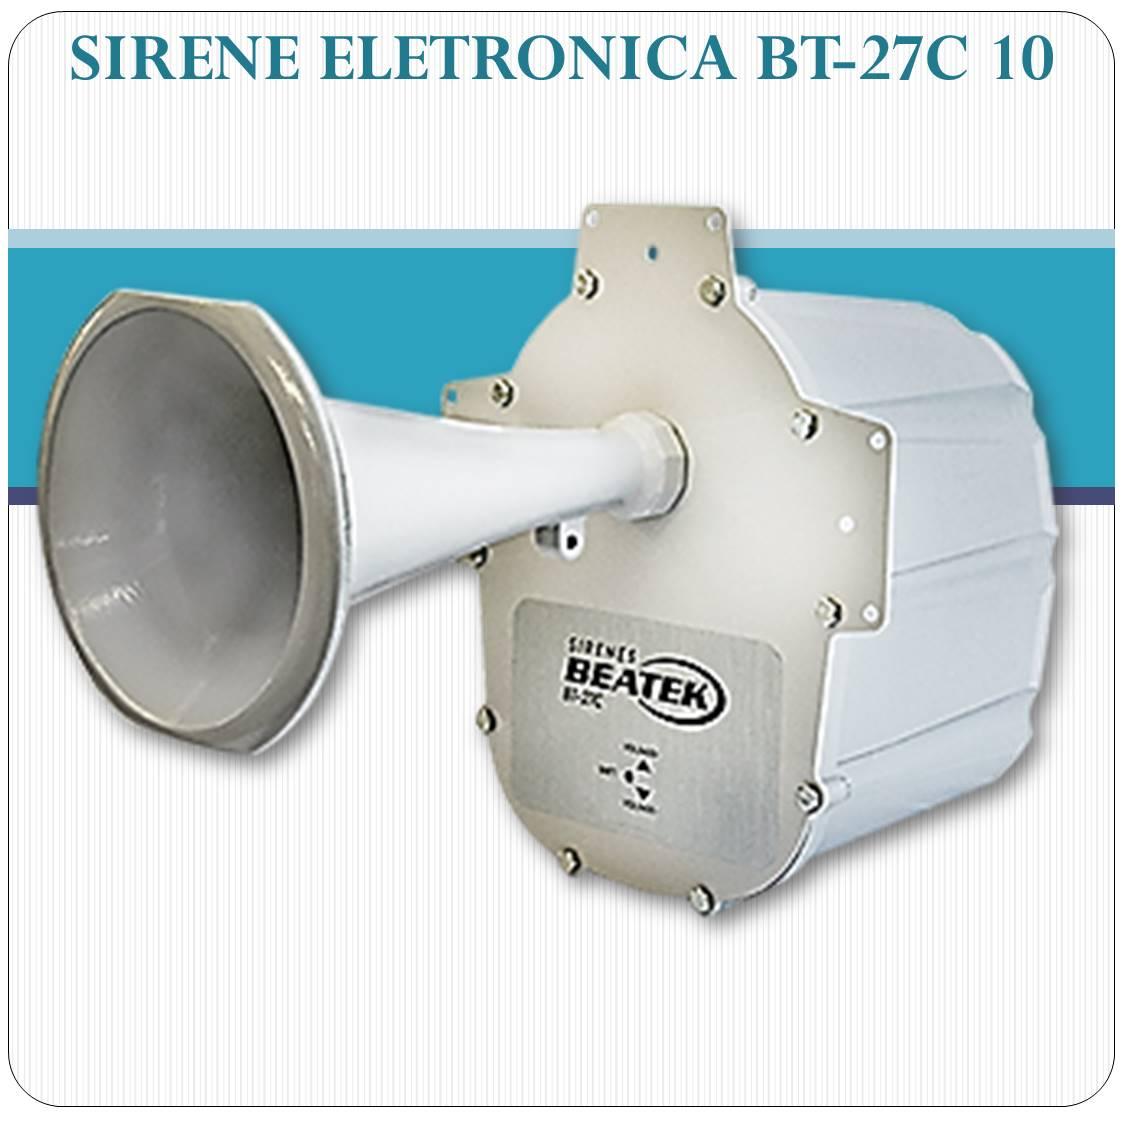 Sirene Eletrônica de Alta Potência BEATEK BT-27C 10